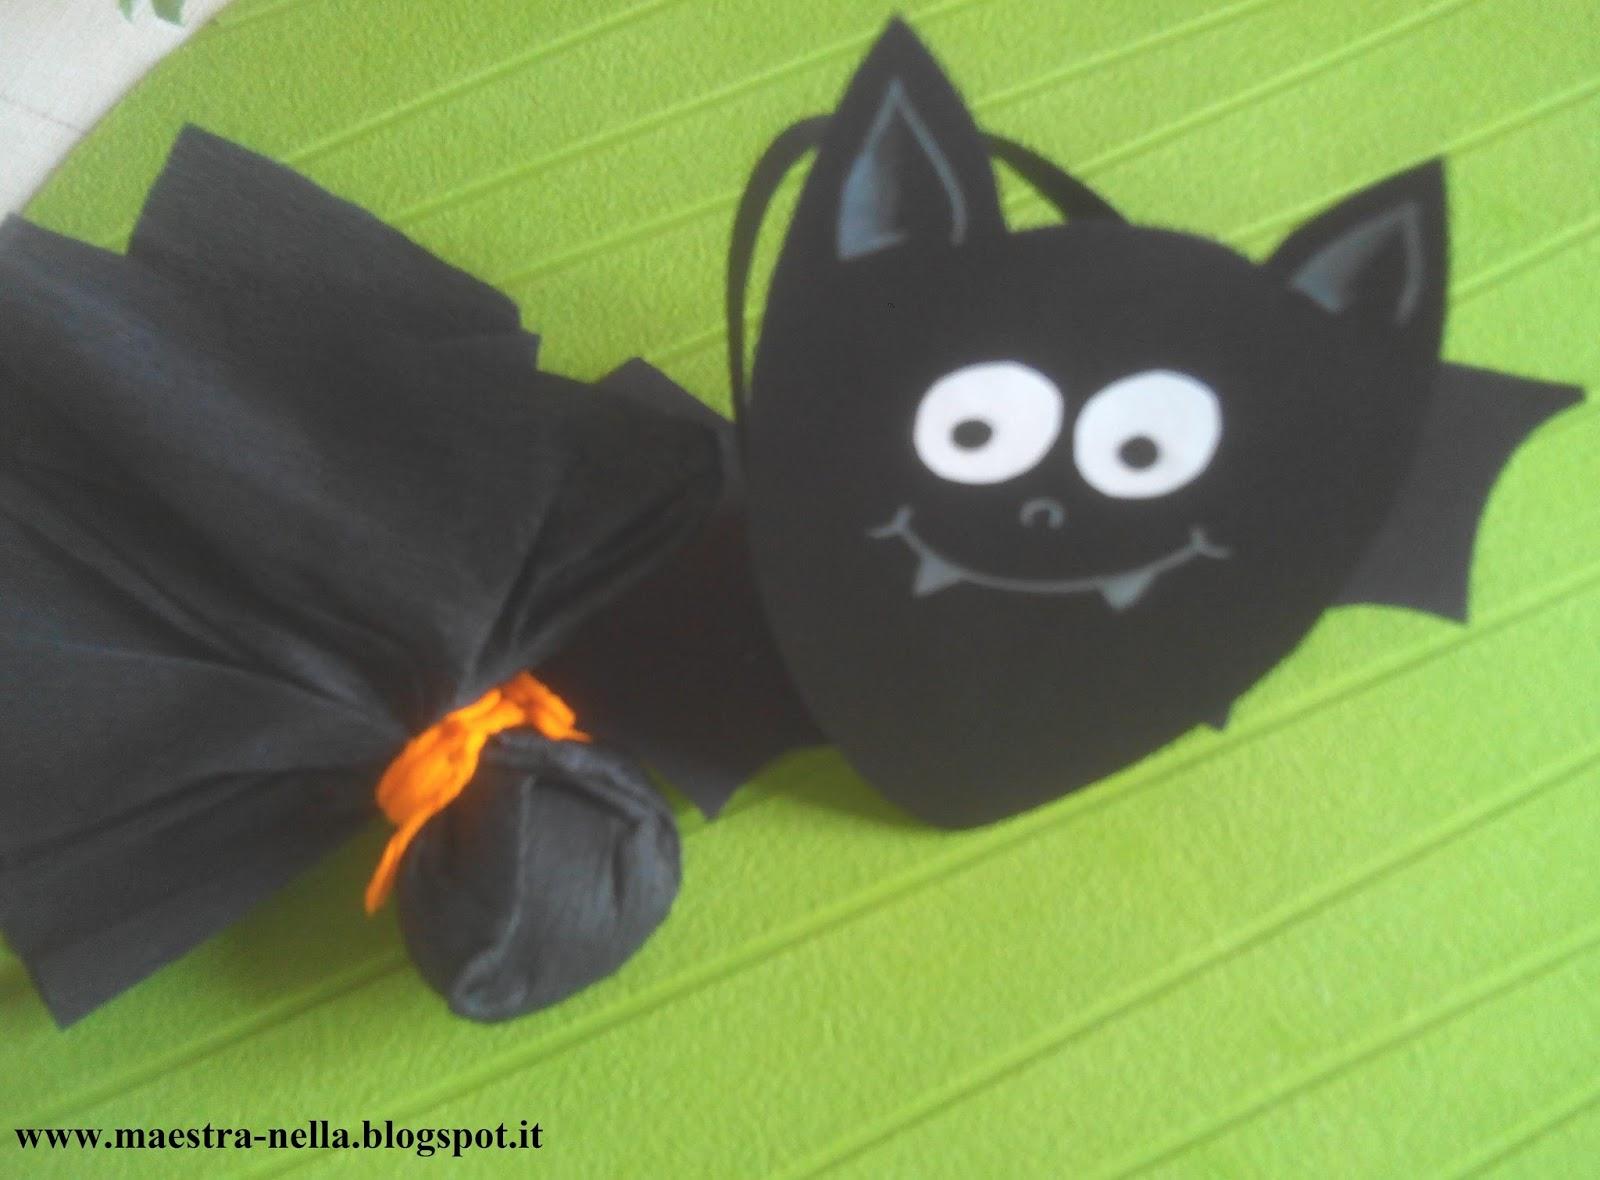 Fabuleux maestra Nella: pipistrelli e fantasmiche pauraaaa!!! QX35